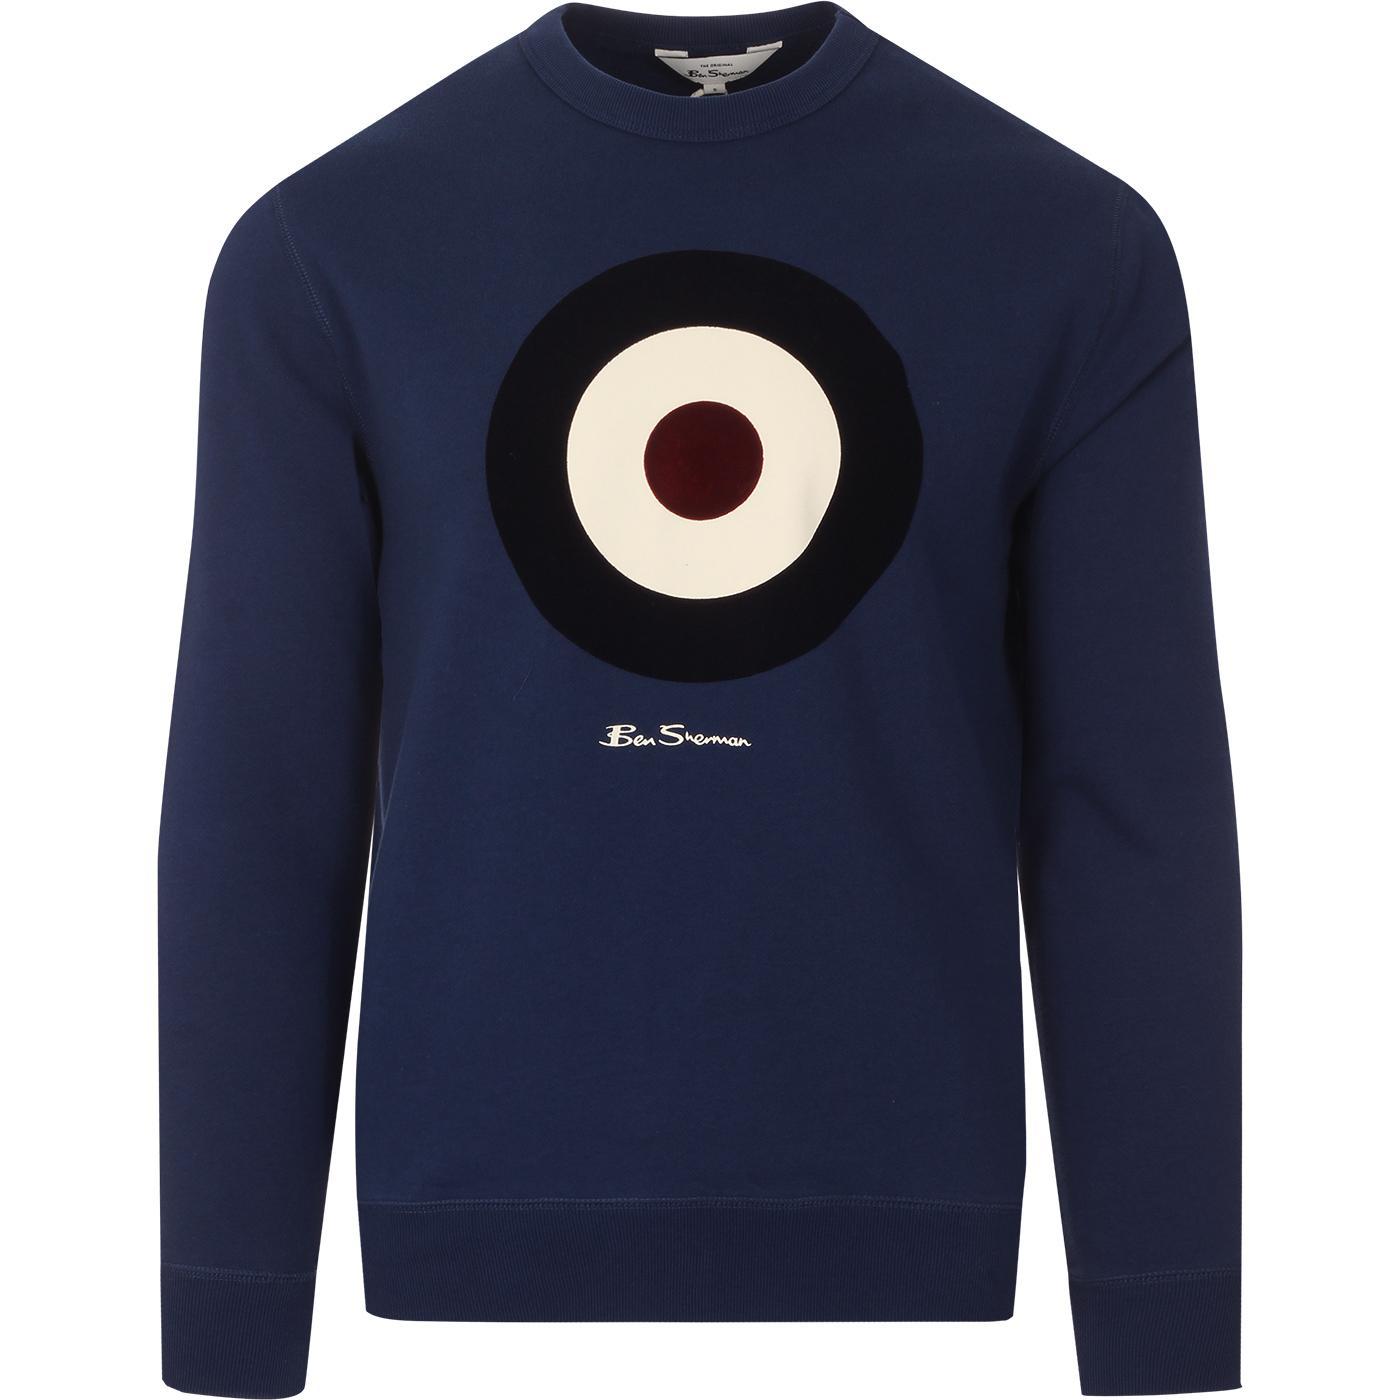 BEN SHERMAN Mod Target Signature Sweatshirt (Ink)